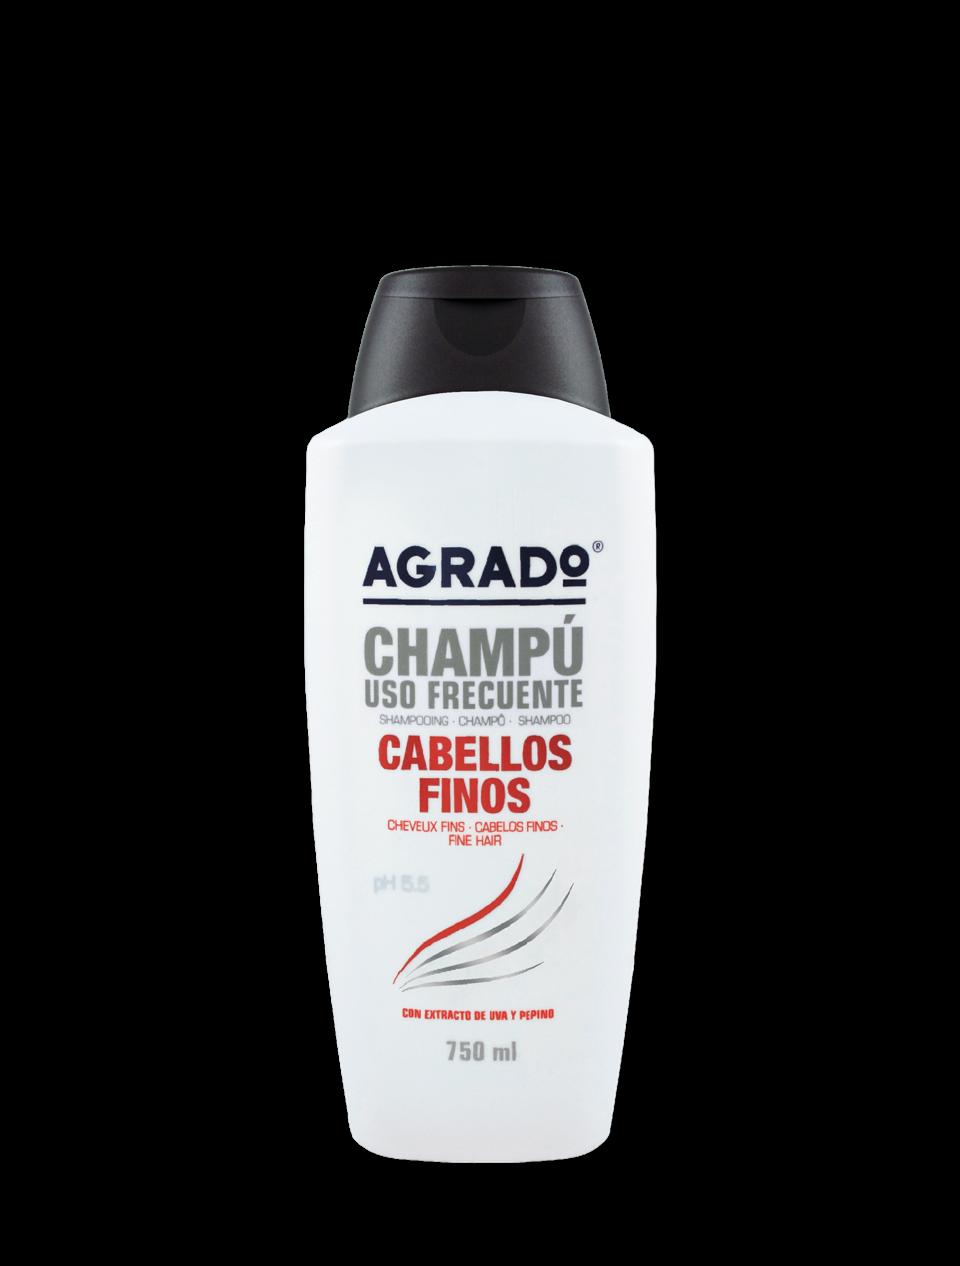 champu-uso-frecuente-cabellos-finos-agrado-5971